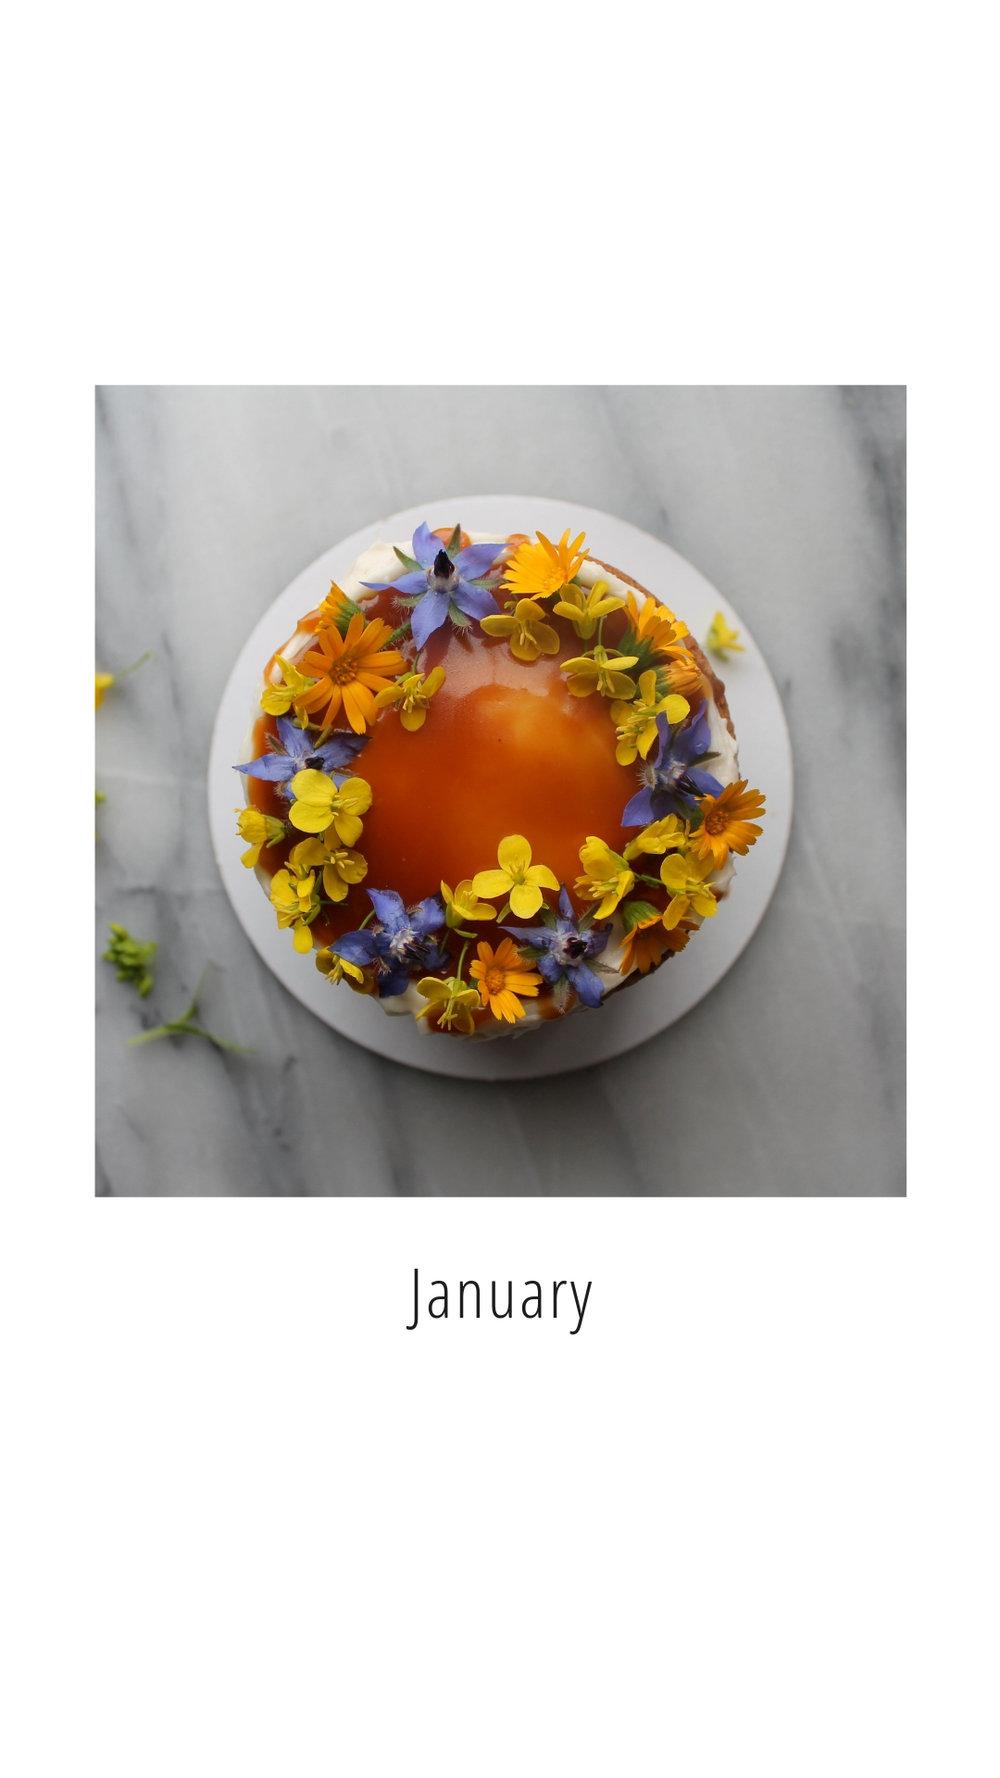 January Cake Styling Inspiration